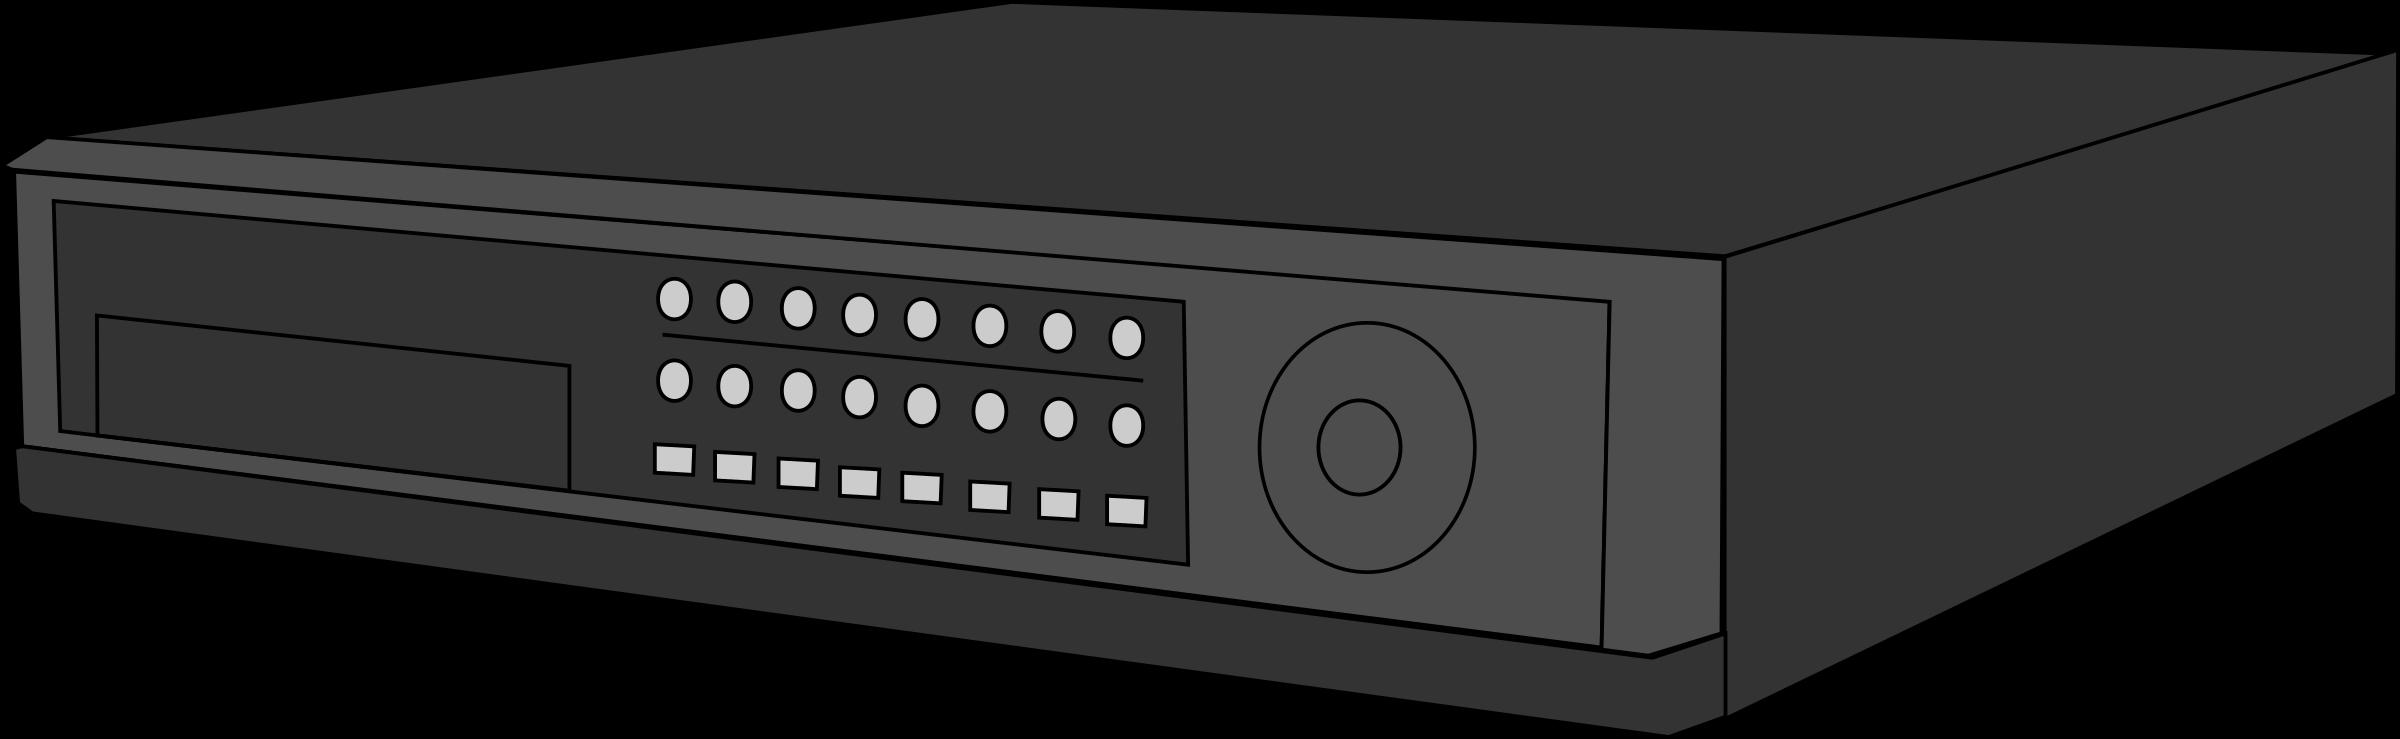 video recording device